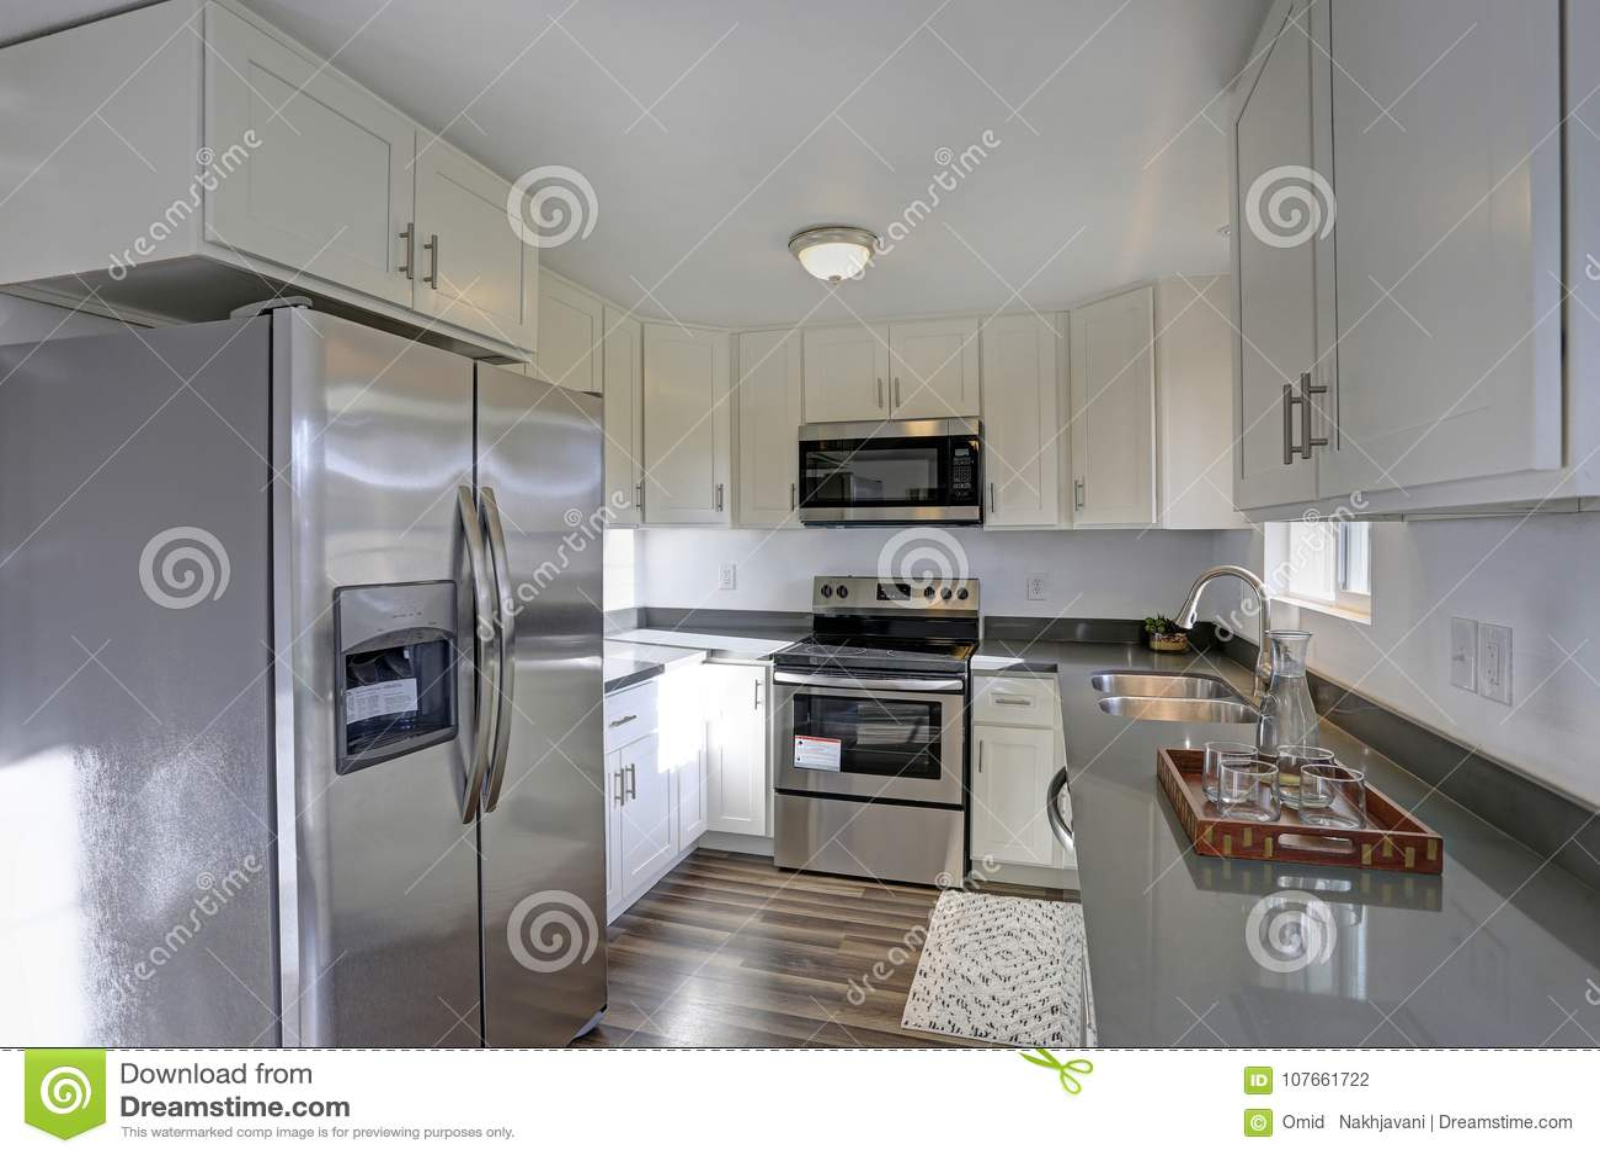 compact kitchens free standing kitchen shelves 点燃被填装的家庭内部特点小紧凑厨房库存照片 图片包括有设计 拱道 点燃有白色内阁和现代不锈钢装置的被填装的家庭内部特点小紧凑厨房